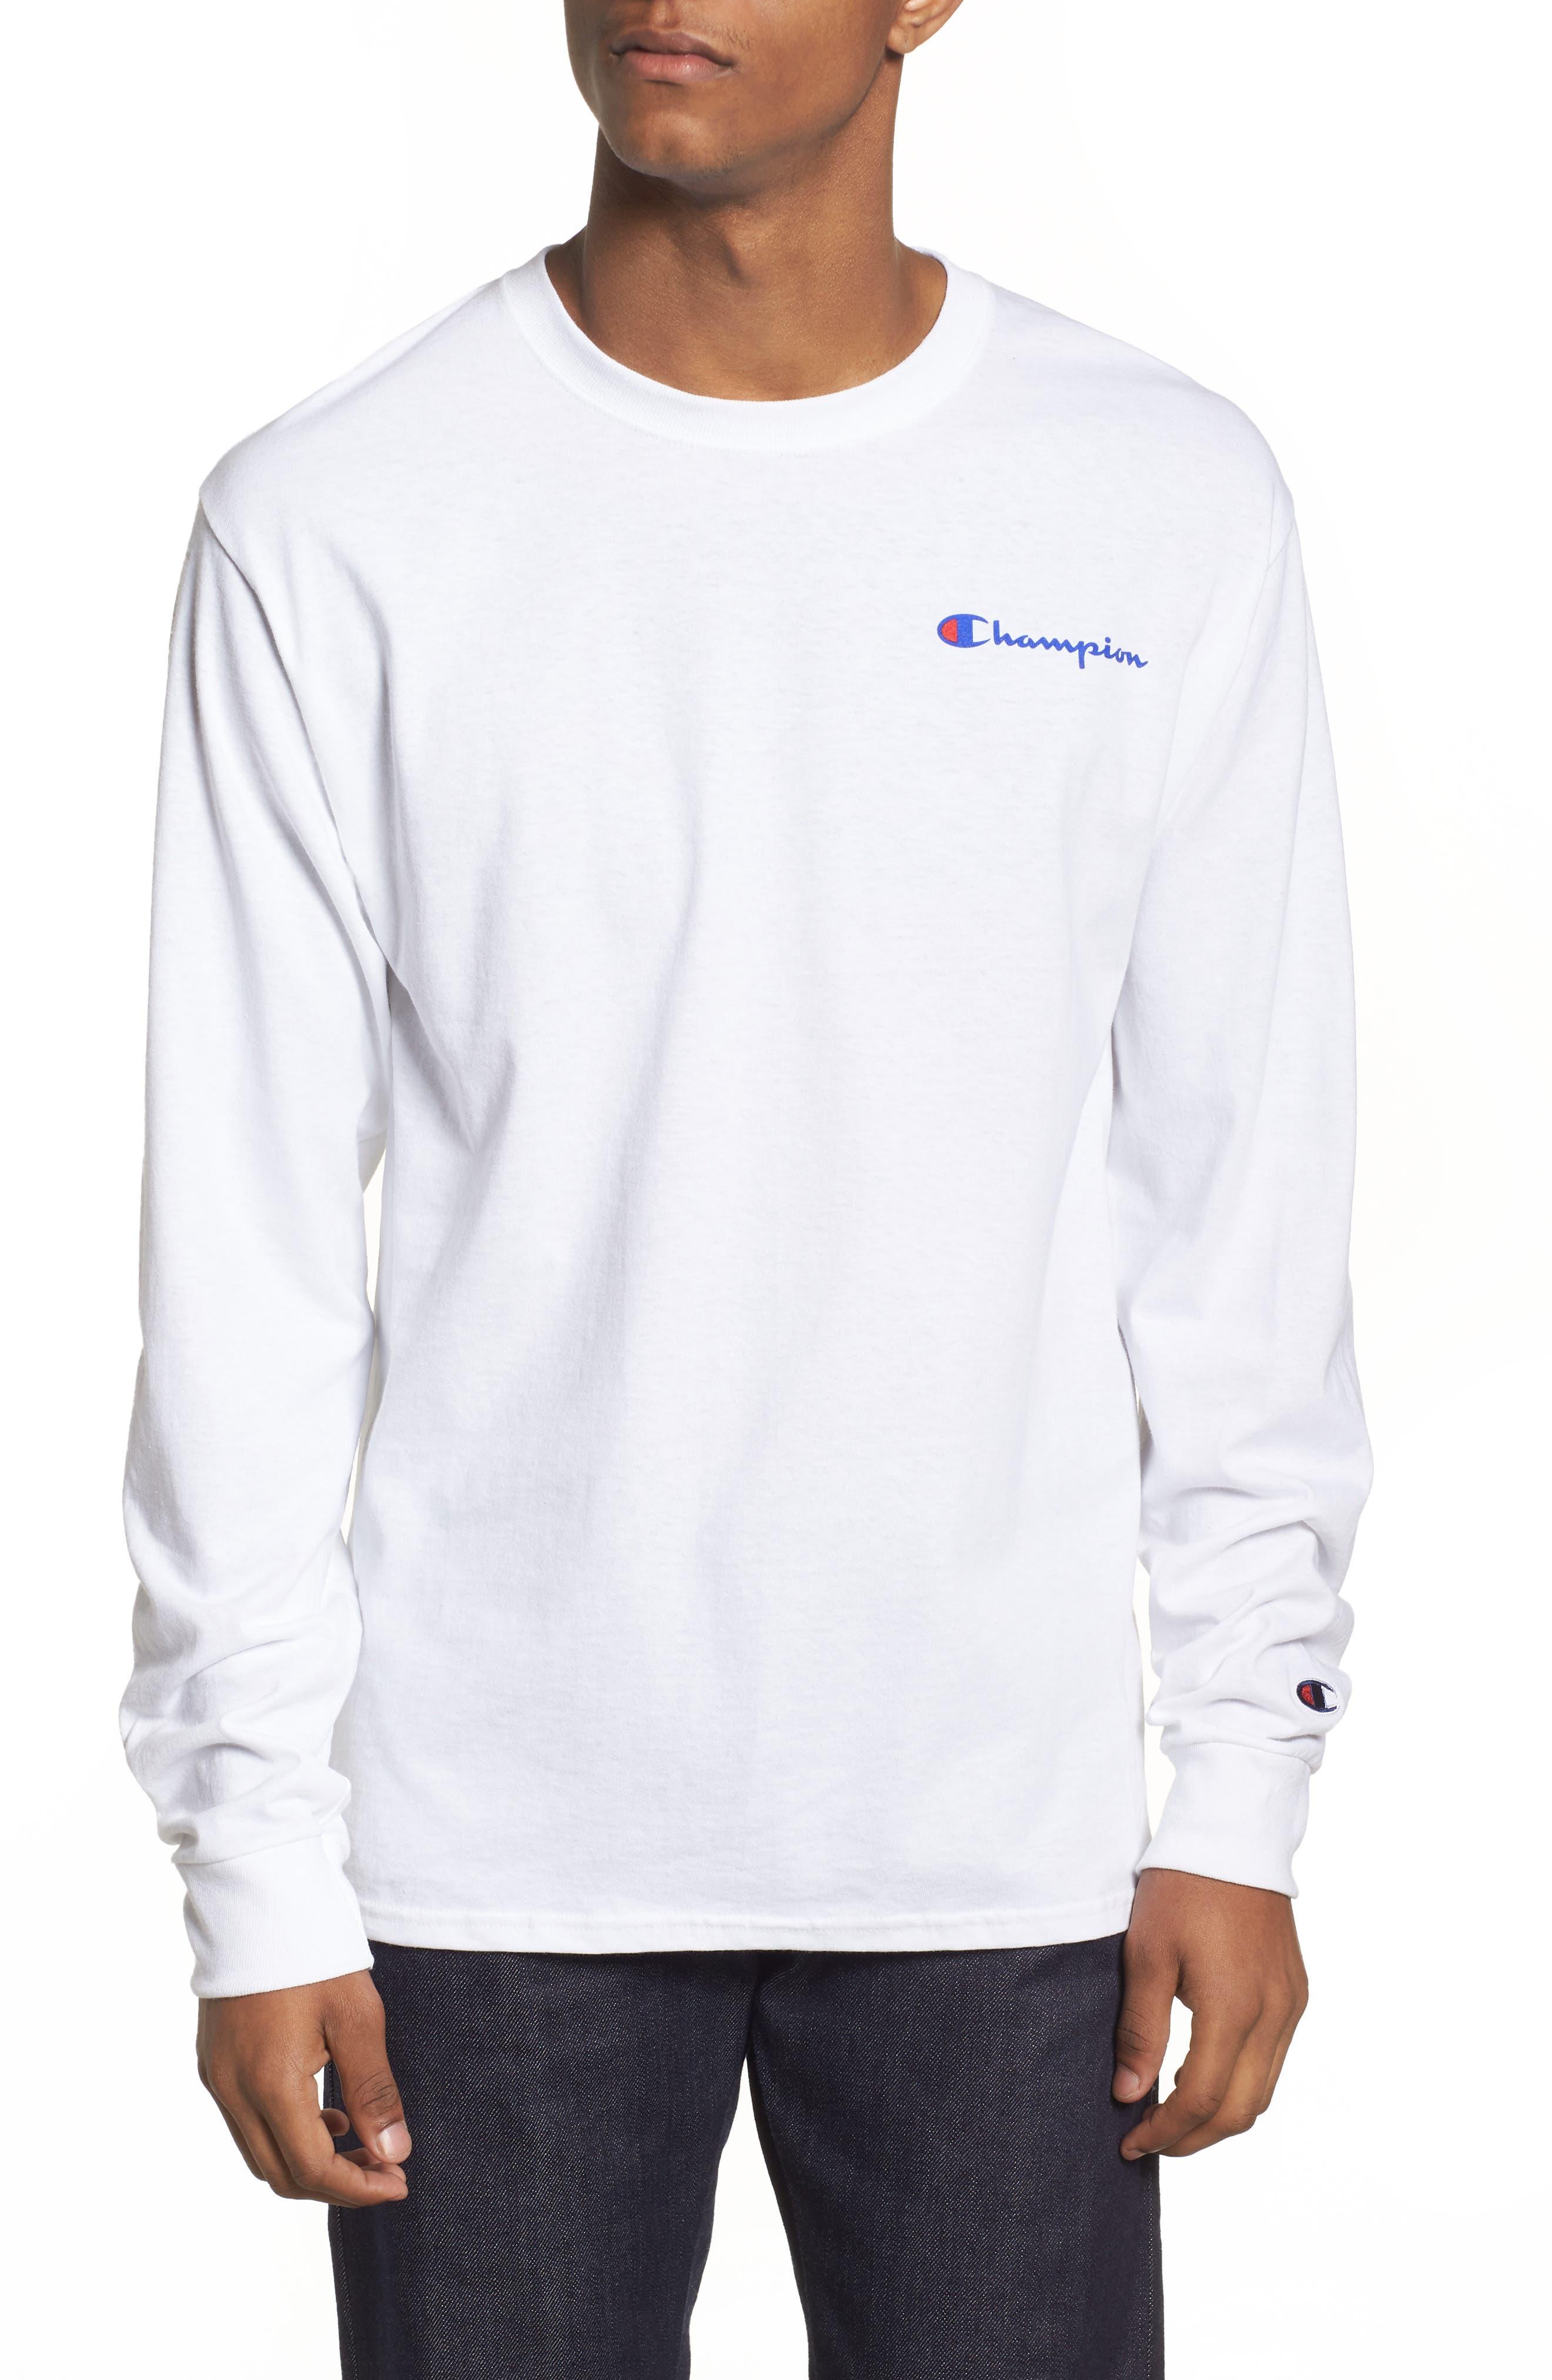 Snoopy Unisex Long Sleeve T-Shirt,                             Alternate thumbnail 2, color,                             White